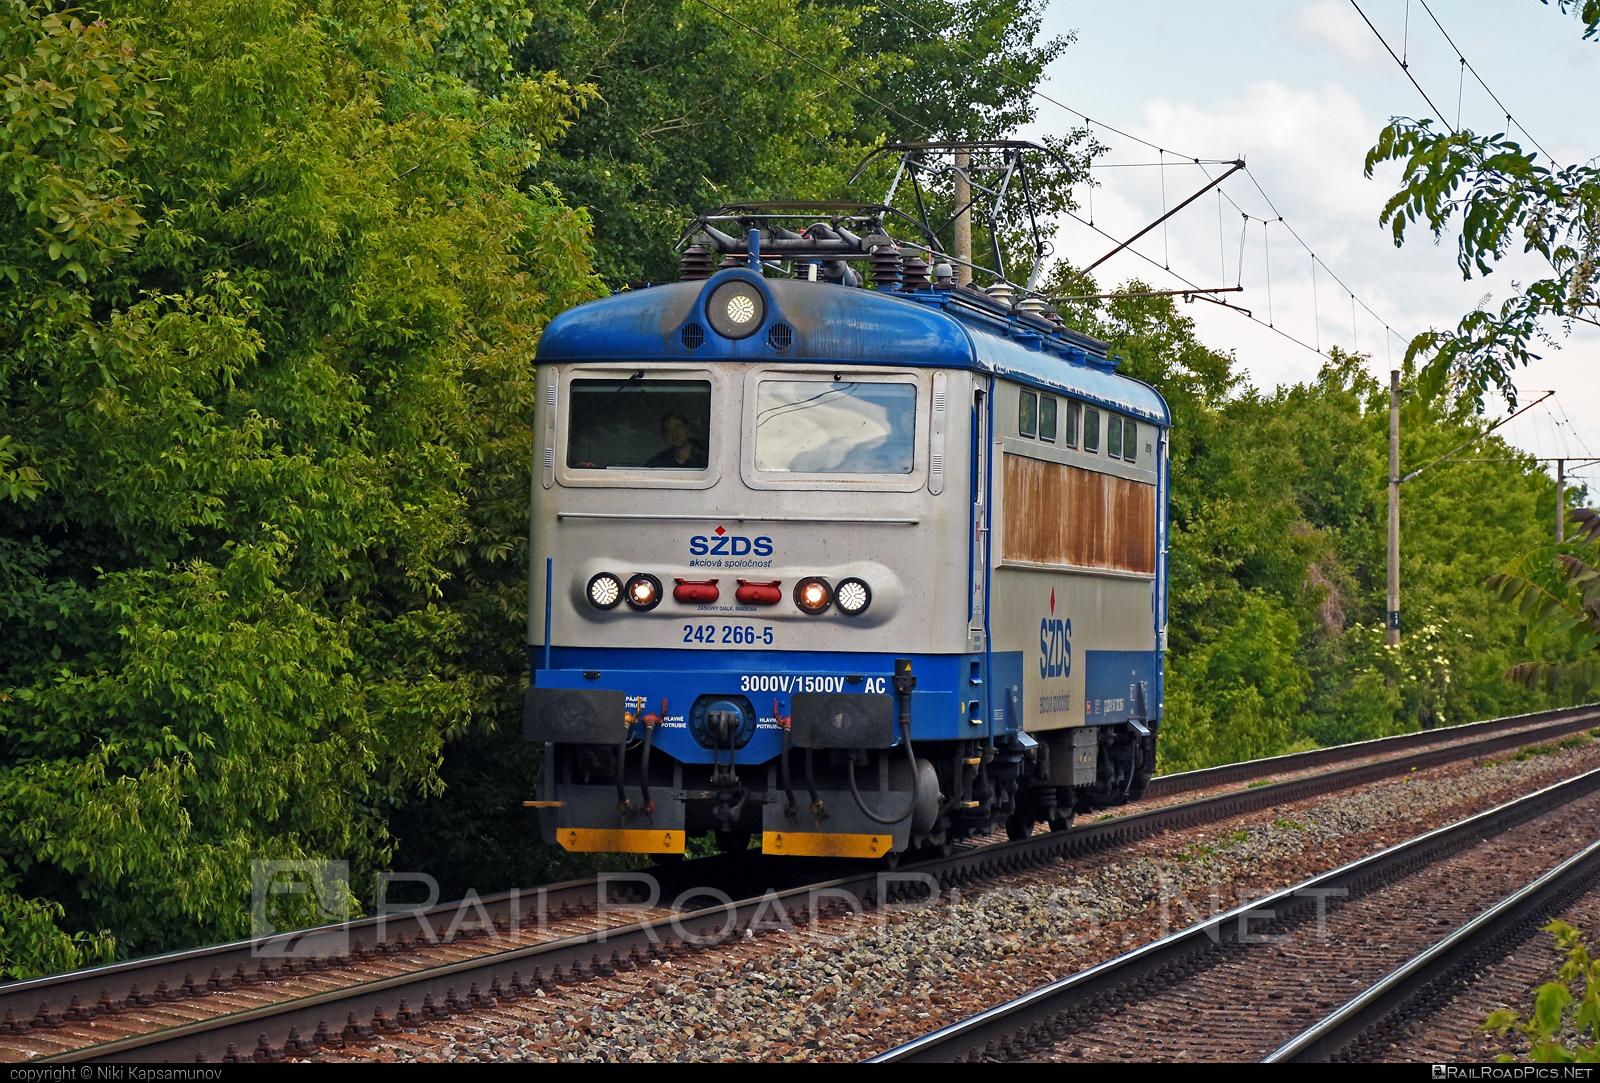 Škoda 73E - 242 266-5 operated by I. G. Rail, s. r. o. #igrail #locomotive242 #plechac #skoda #skoda73e #szds